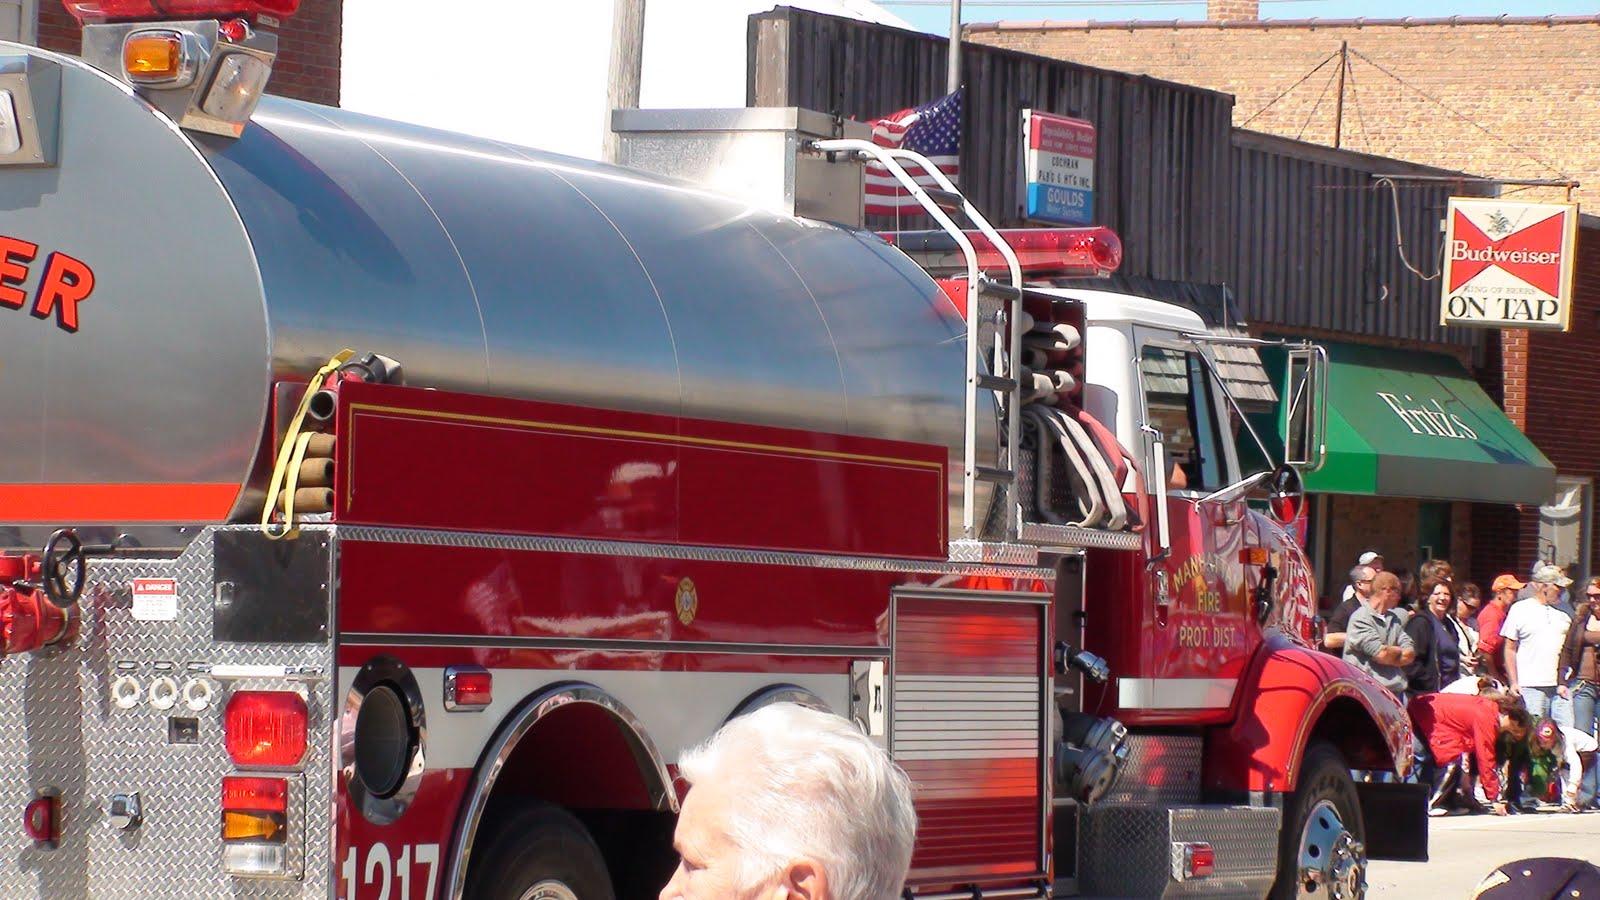 Illinois will county manhattan - Manhattan Fire Department Tanker In The Manhattan Fun Days Parade